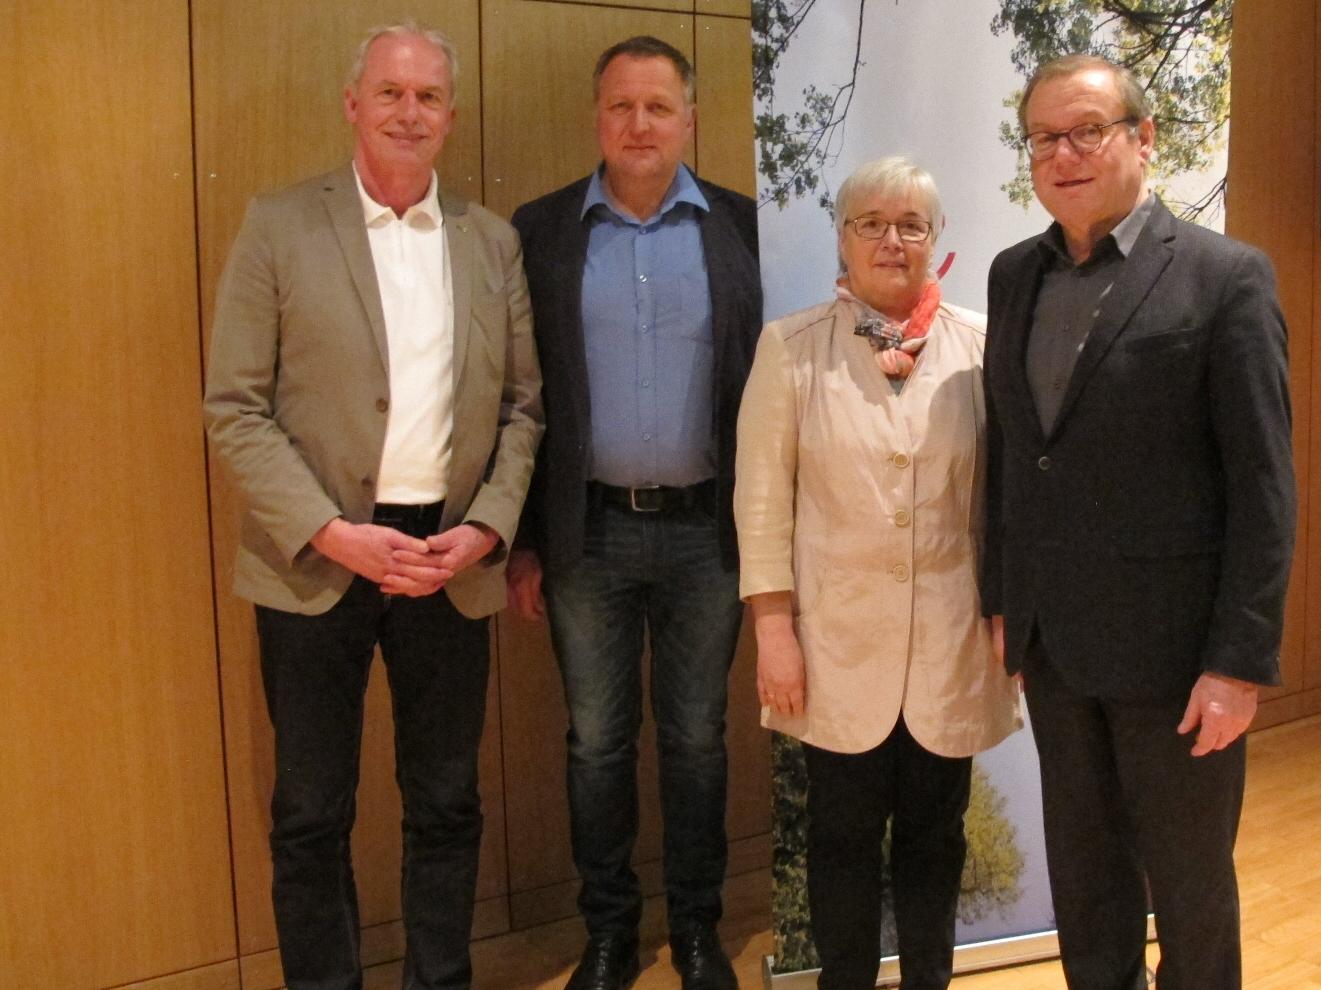 Bürgermeister Gottfried Brändle, Obmann Markus Humml, Kassierin Ingeborg Hellweger, Landesobmann Herbert Schwendinger